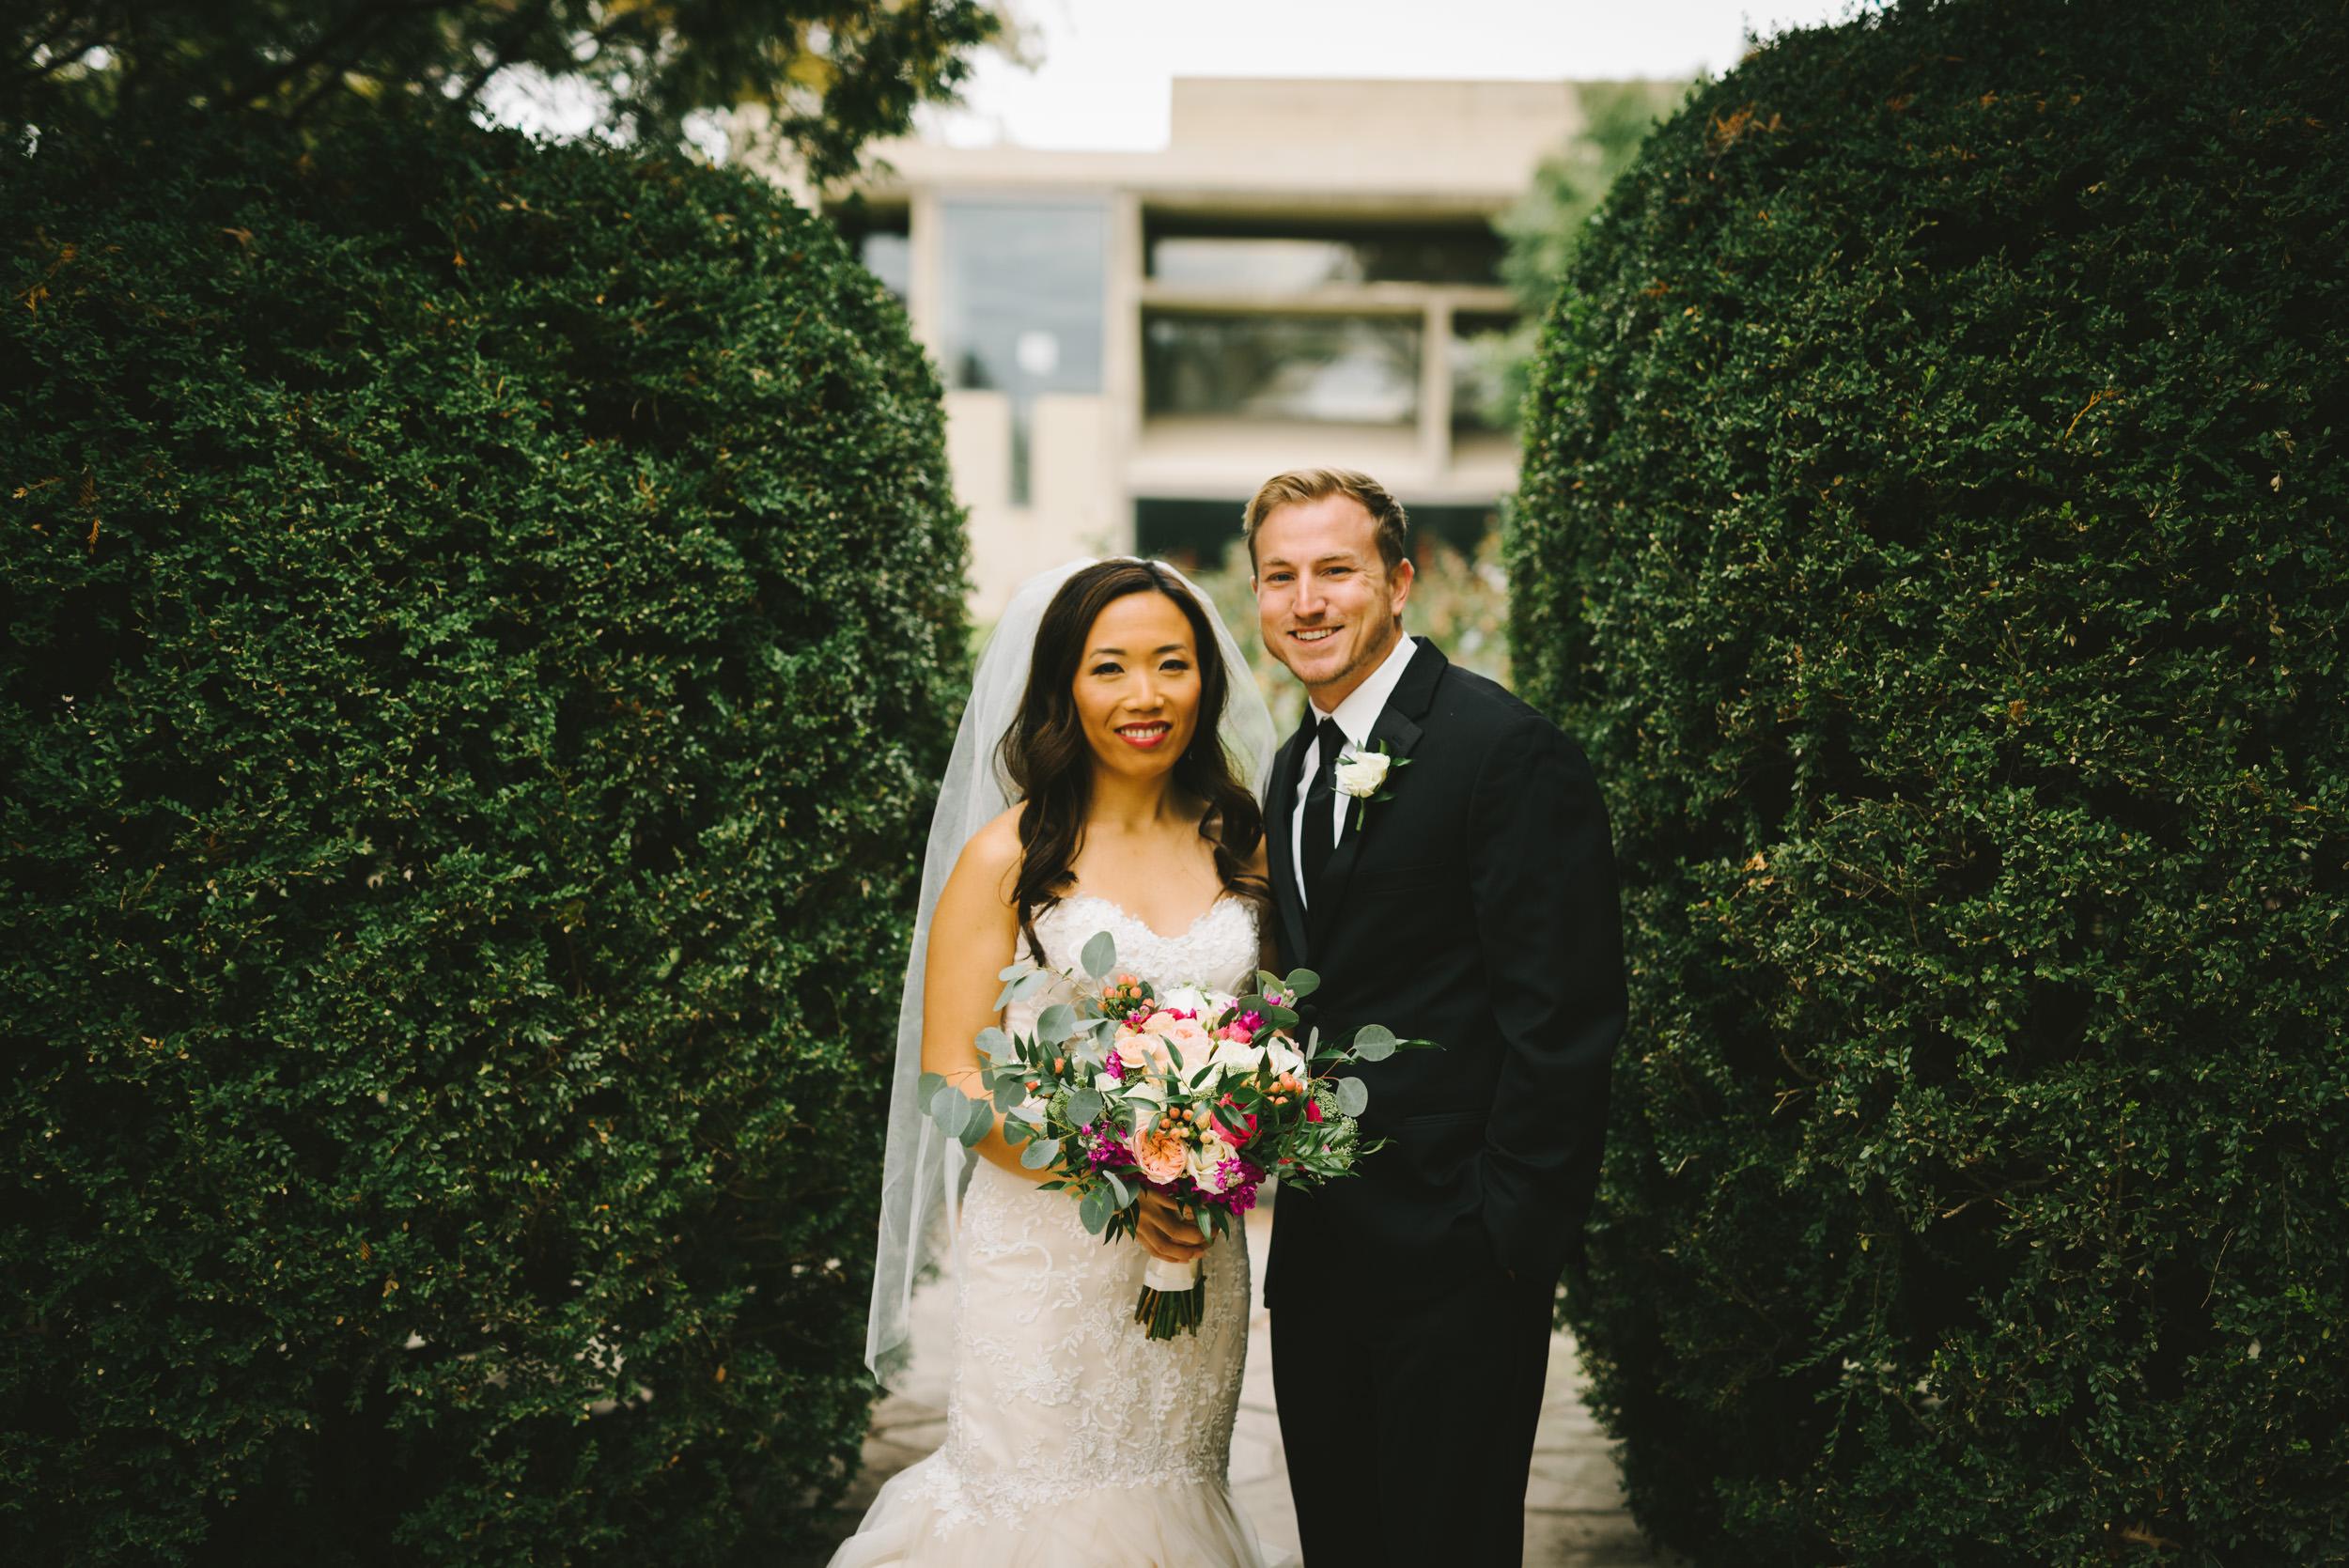 20171029_Wedding-Kristin-Garrett-097.jpg